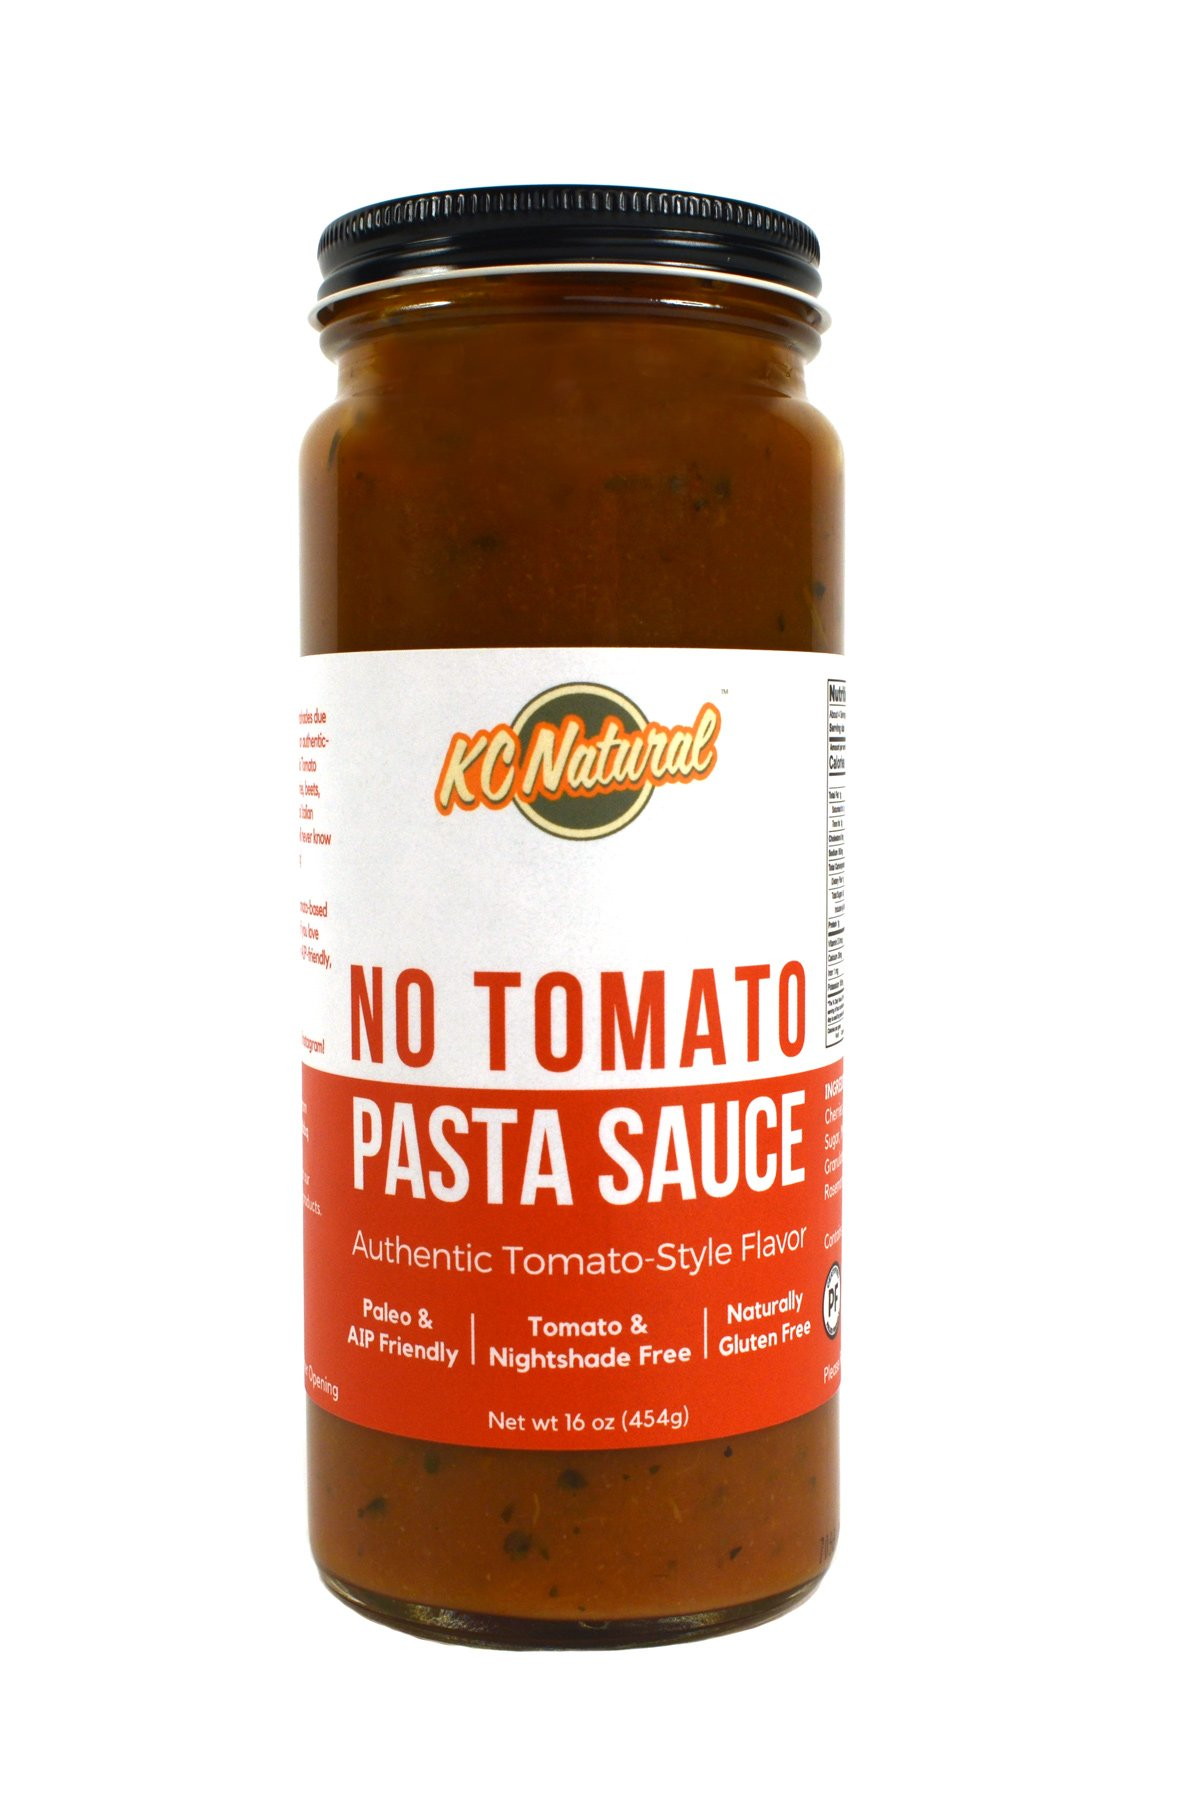 No Tomato Pasta Sauce (1-pack)